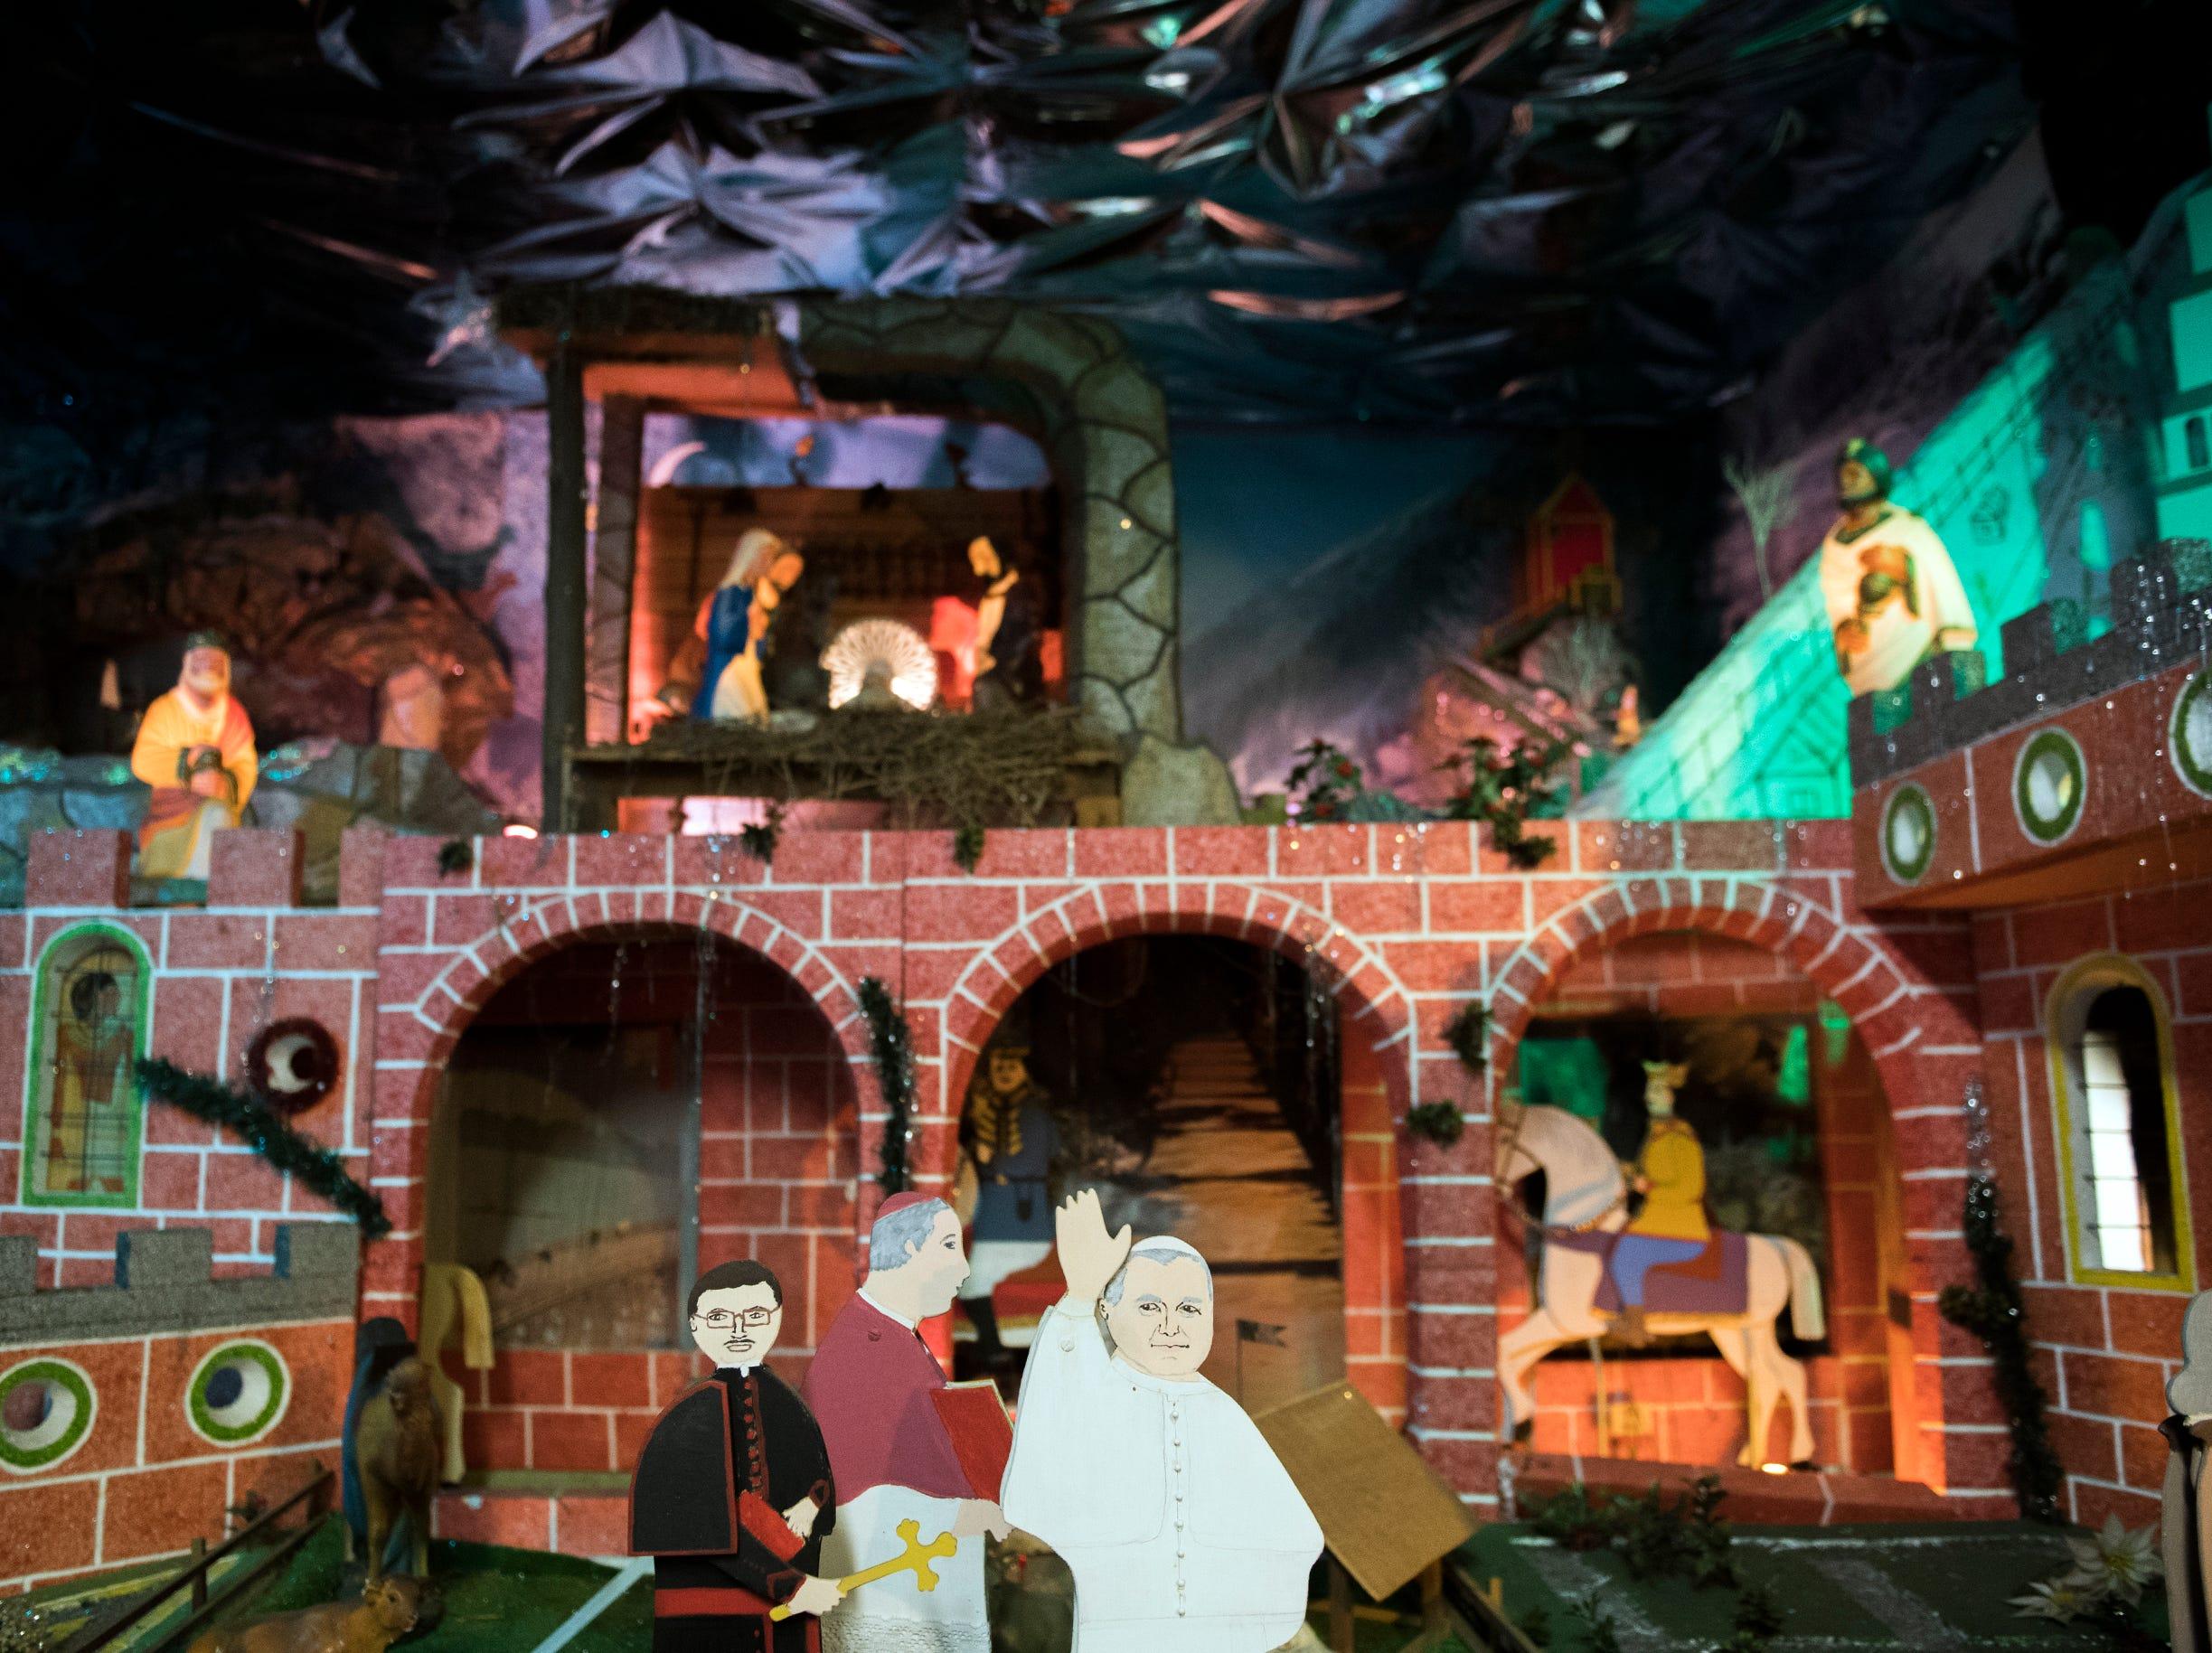 A moving nativity display inside St. Joseph Roman Catholic Church Thursday, Feb. 28, 2019 in Camden, N.J.